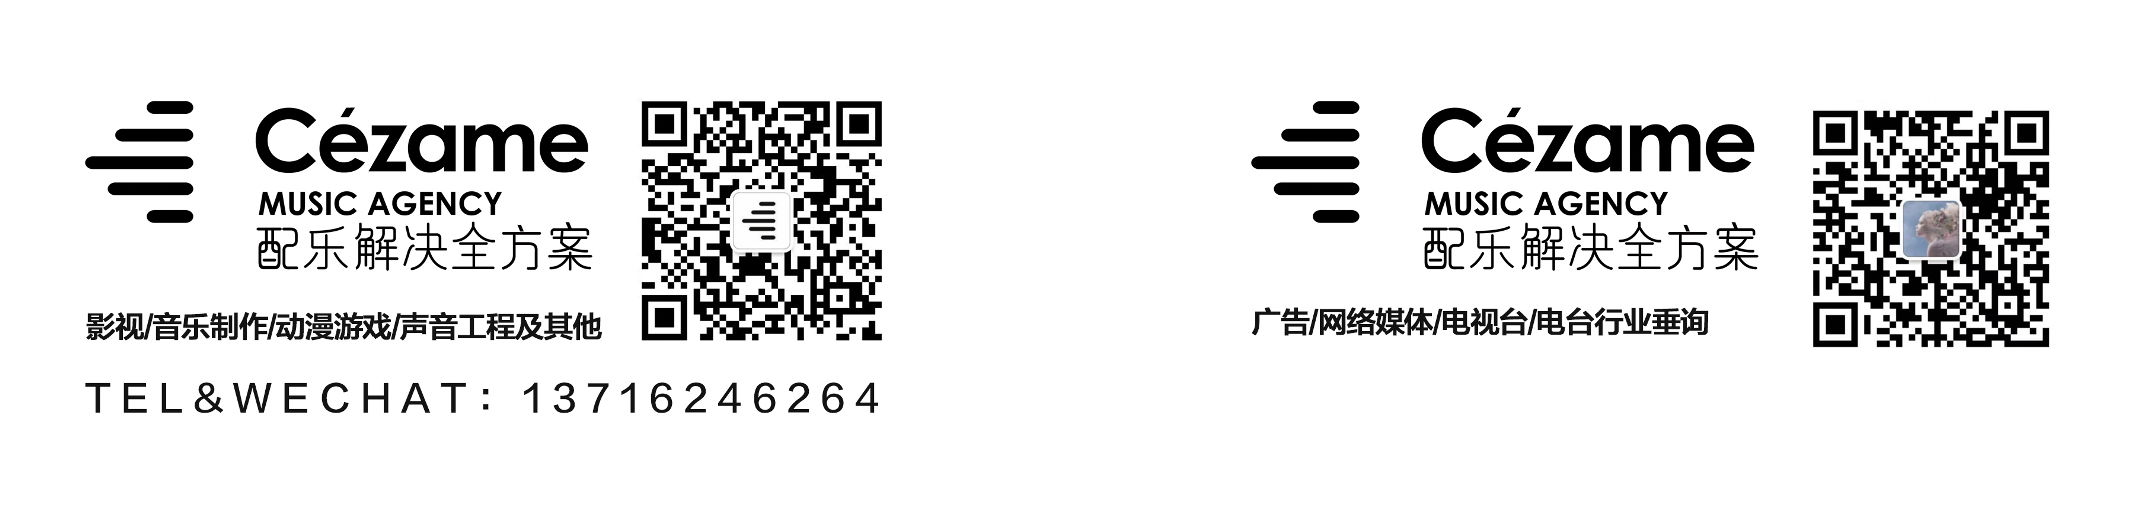 qr code service china